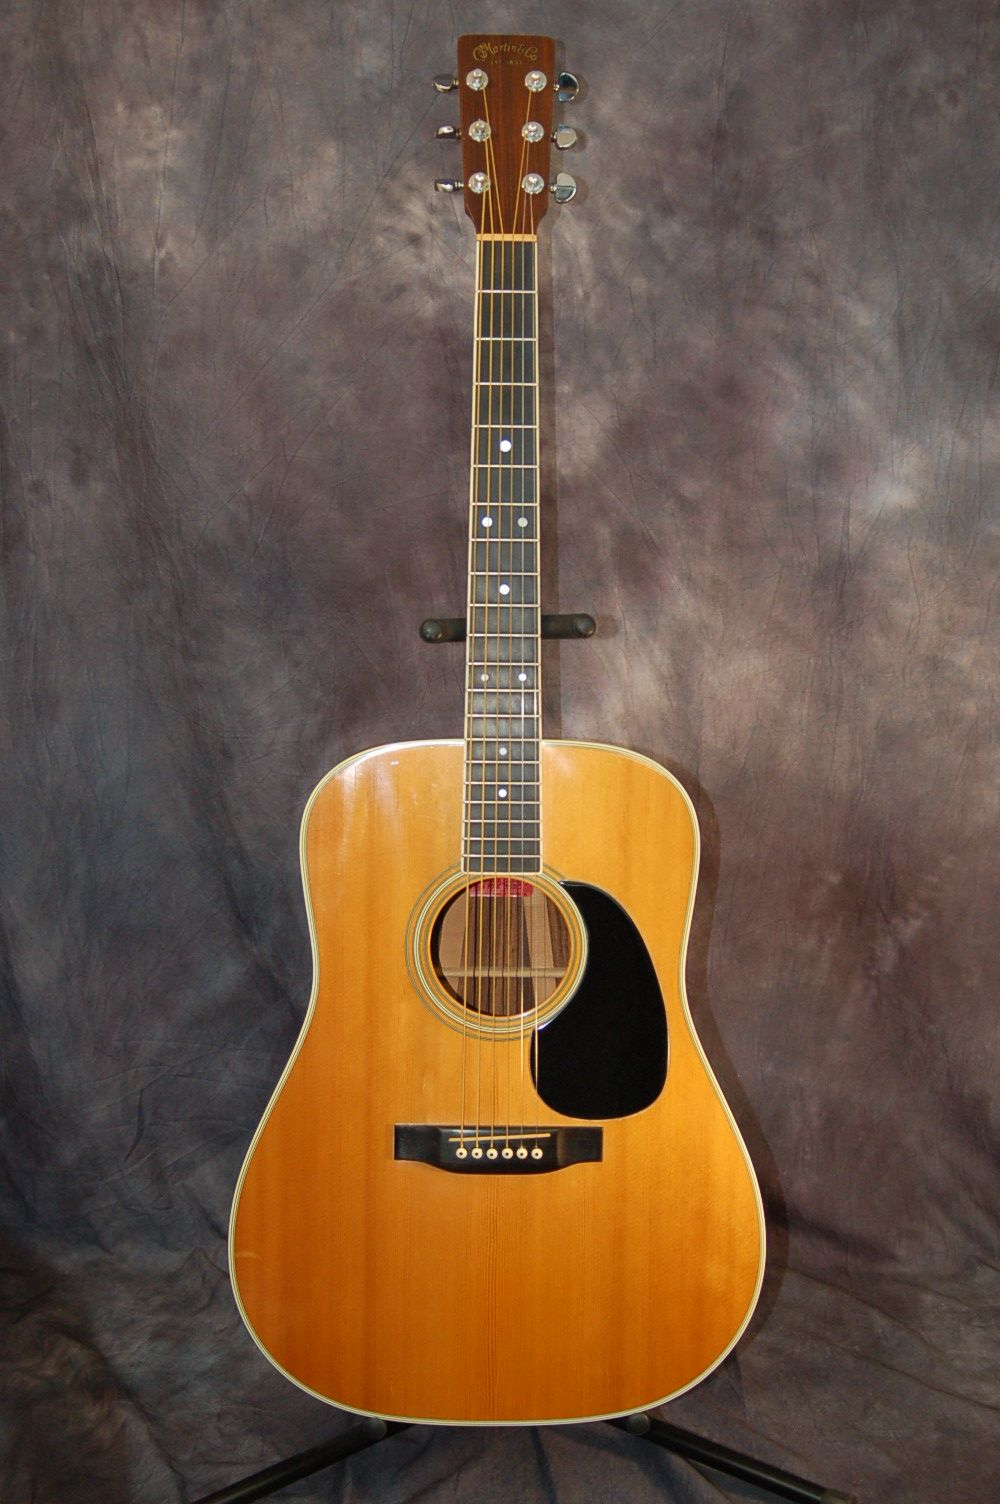 1976 Martin D35 With Original Blue Martin Hardshell Case Lawman Guitars 515 864 6136 Acoustic Guitar Guitar Vintage Guitars